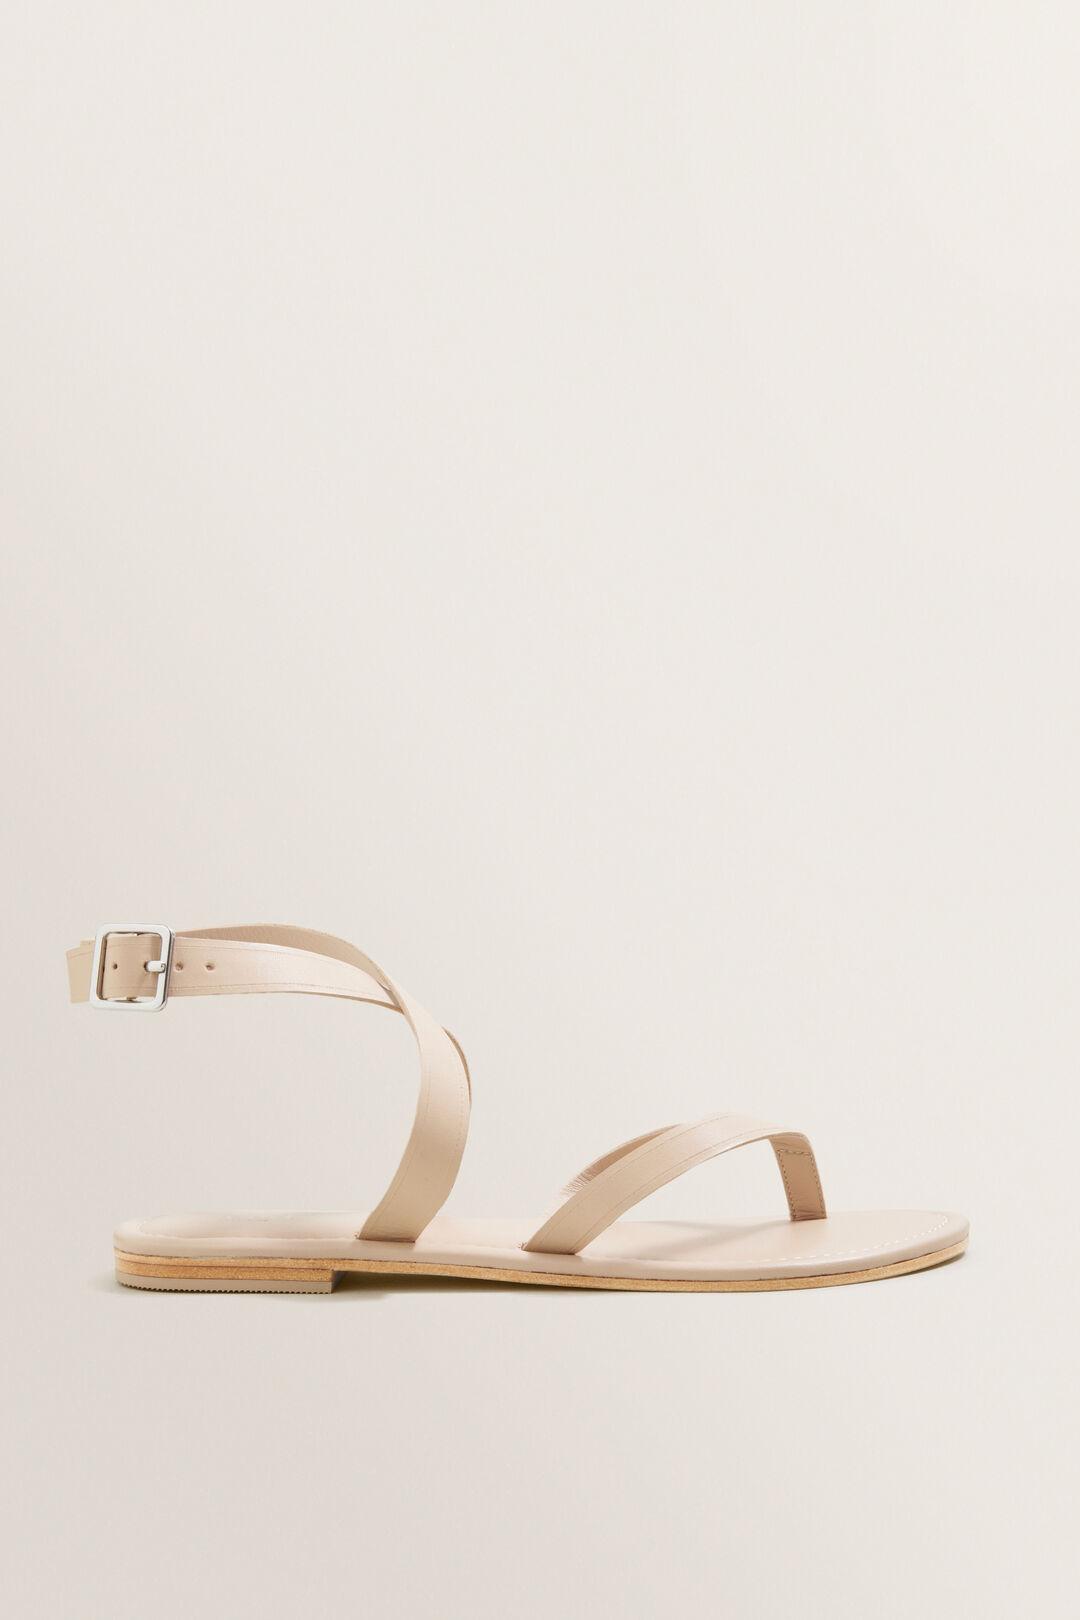 Cooper Sandal  NUDE  hi-res